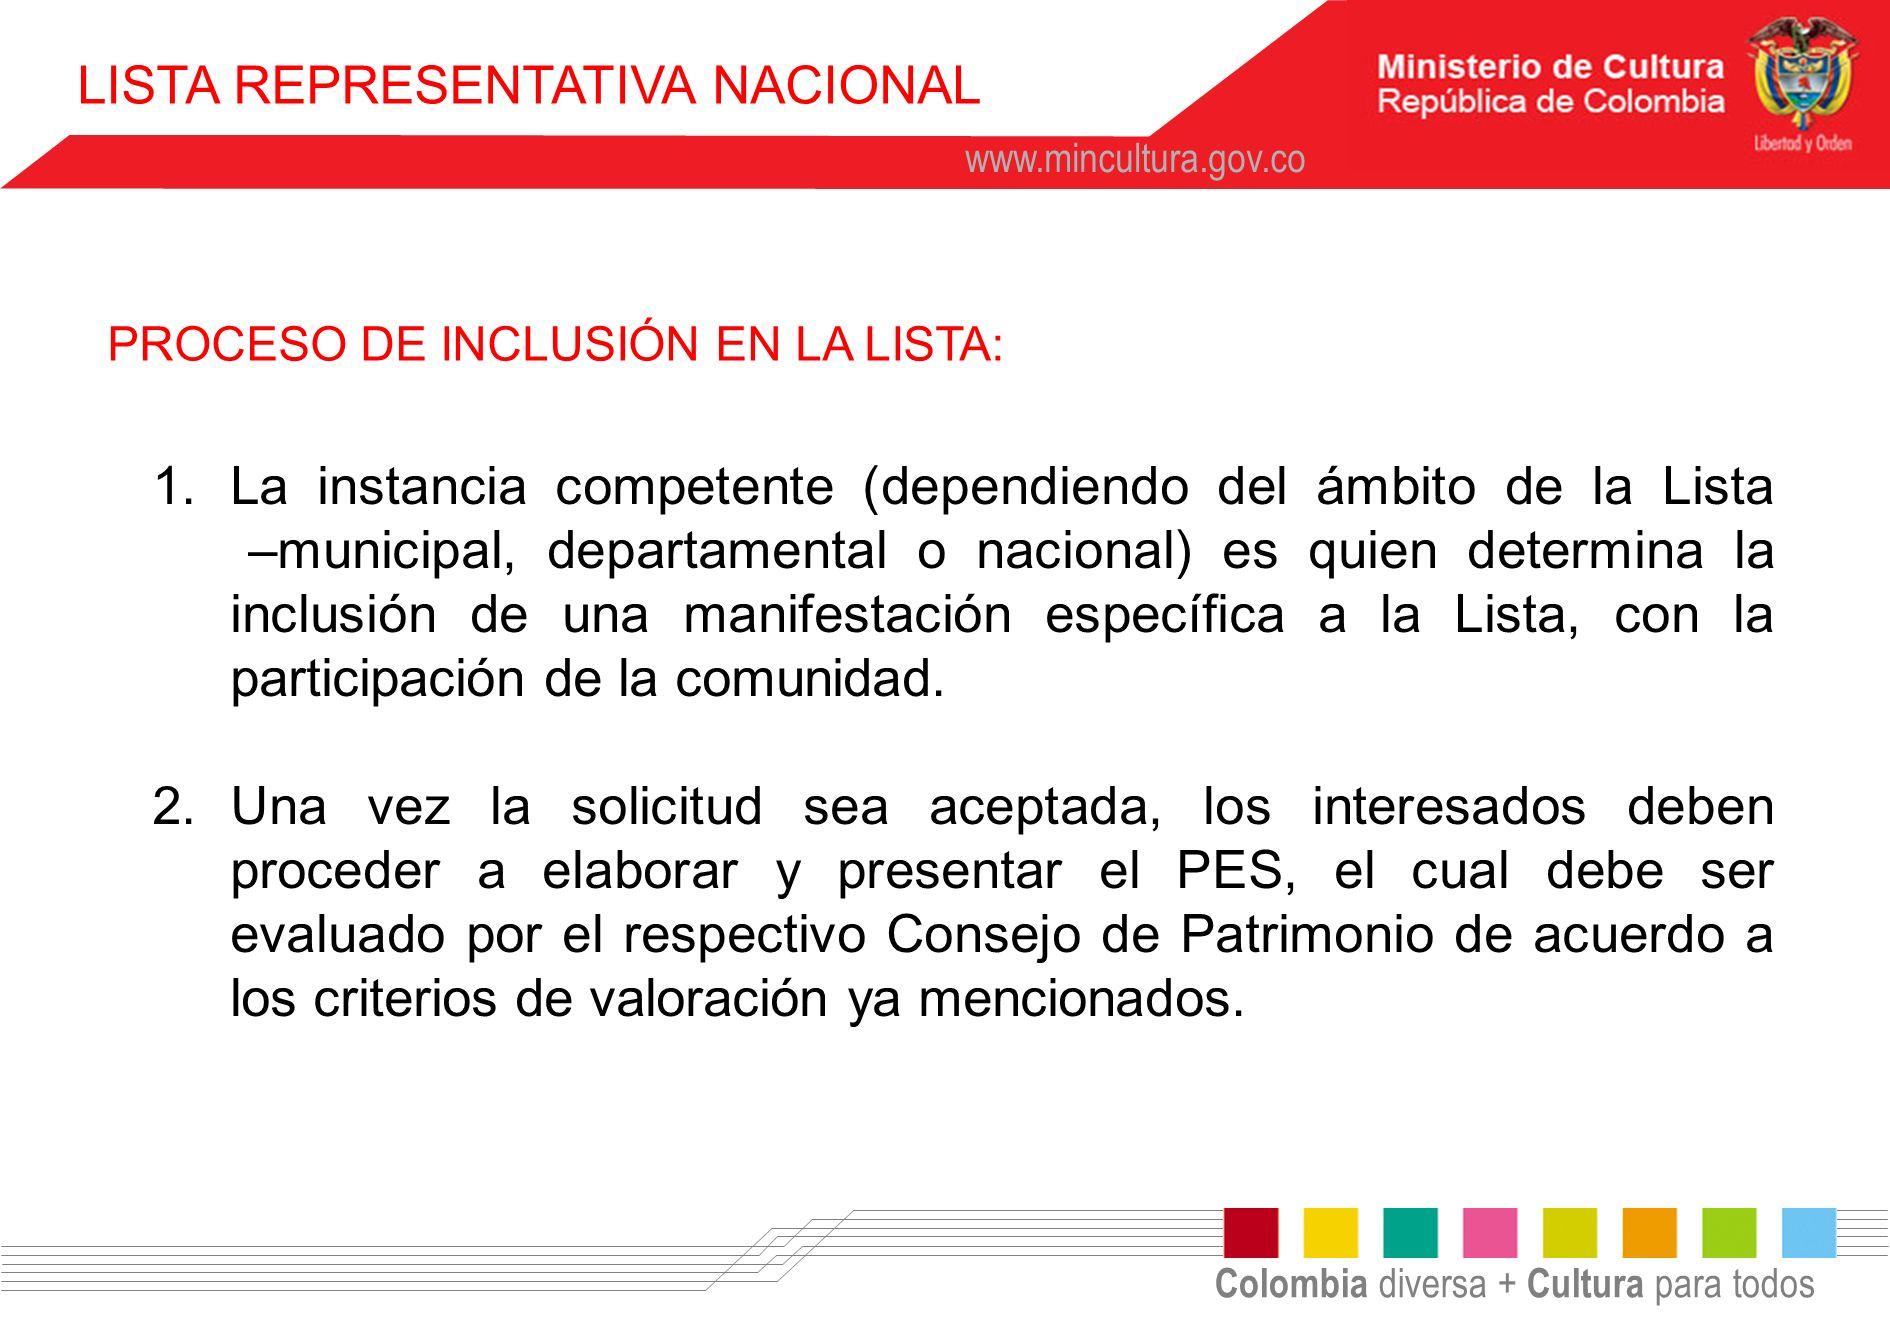 Colombia diversa + Cultura para todos www.mincultura.gov.co 1.La instancia competente (dependiendo del ámbito de la Lista –municipal, departamental o